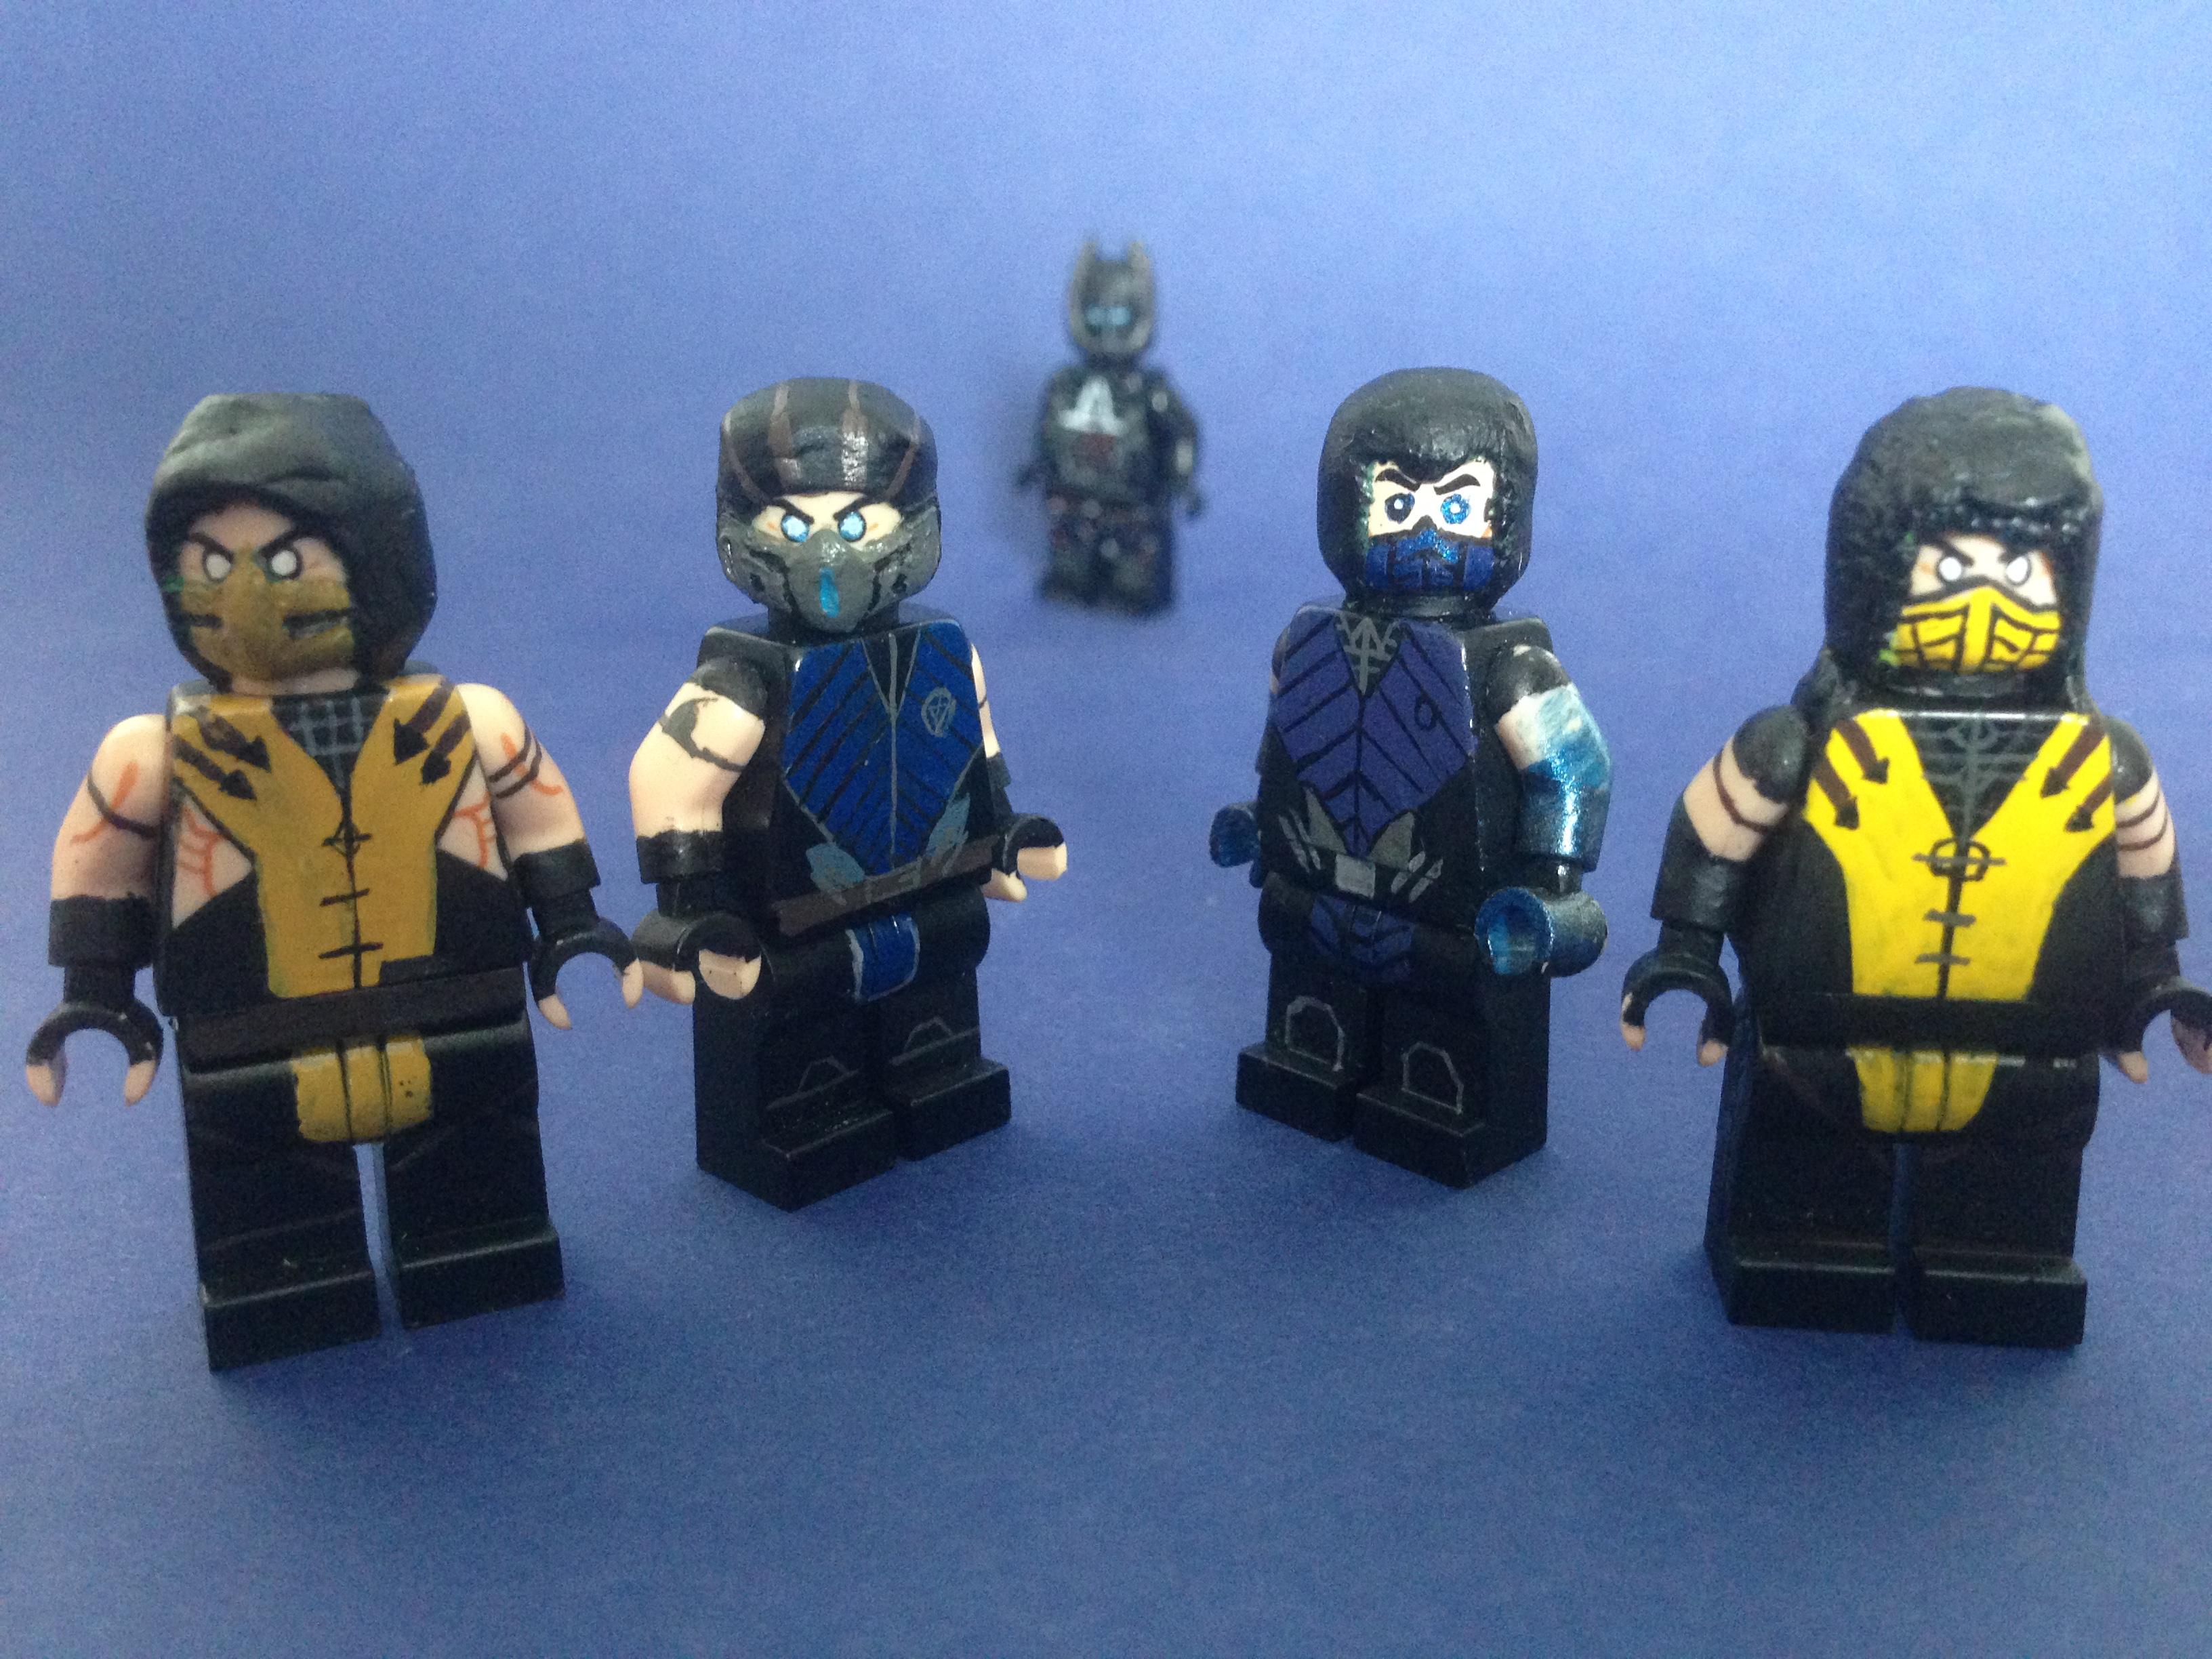 Lego Mortal Kombat All Characters: LEGO Marvel Superheroes ...  Lego Mortal Kom...